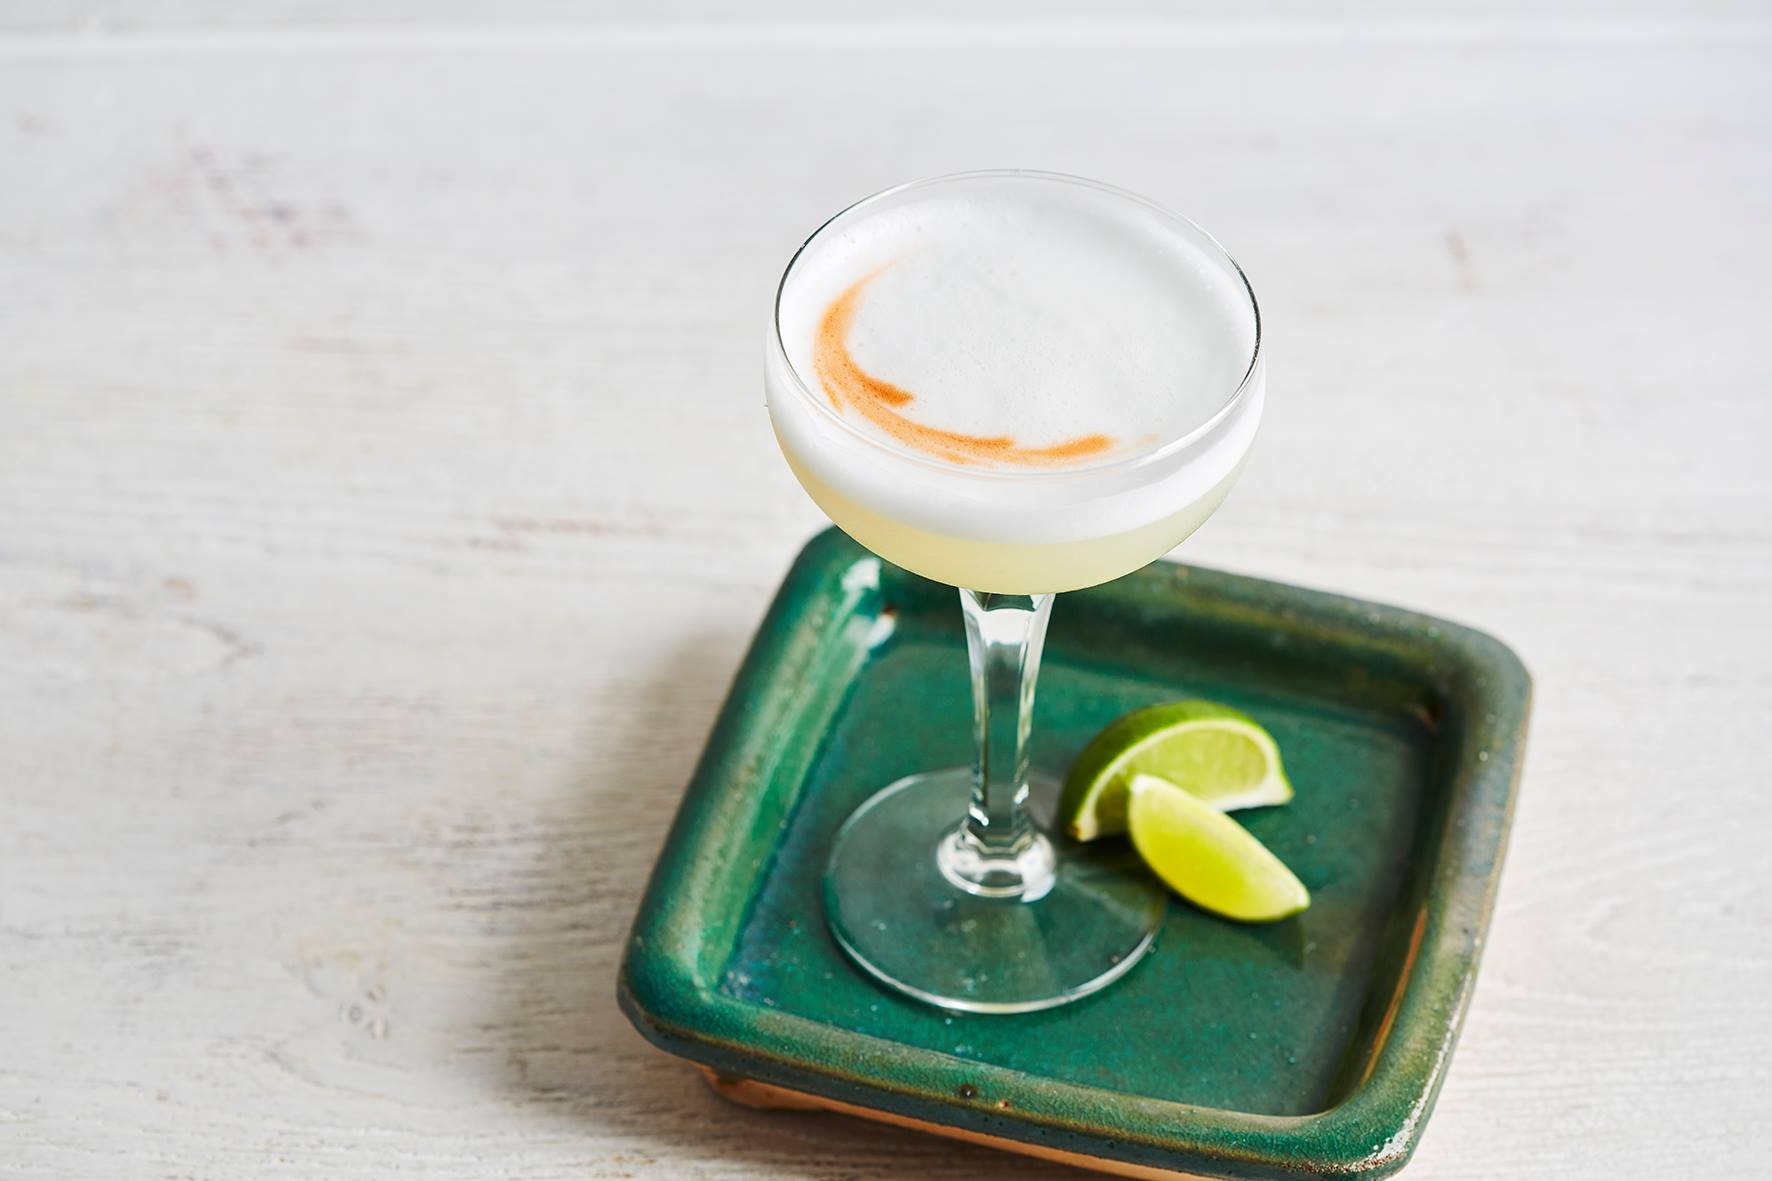 London's Unmissable Cocktail Masterclasses | DesignMyNight